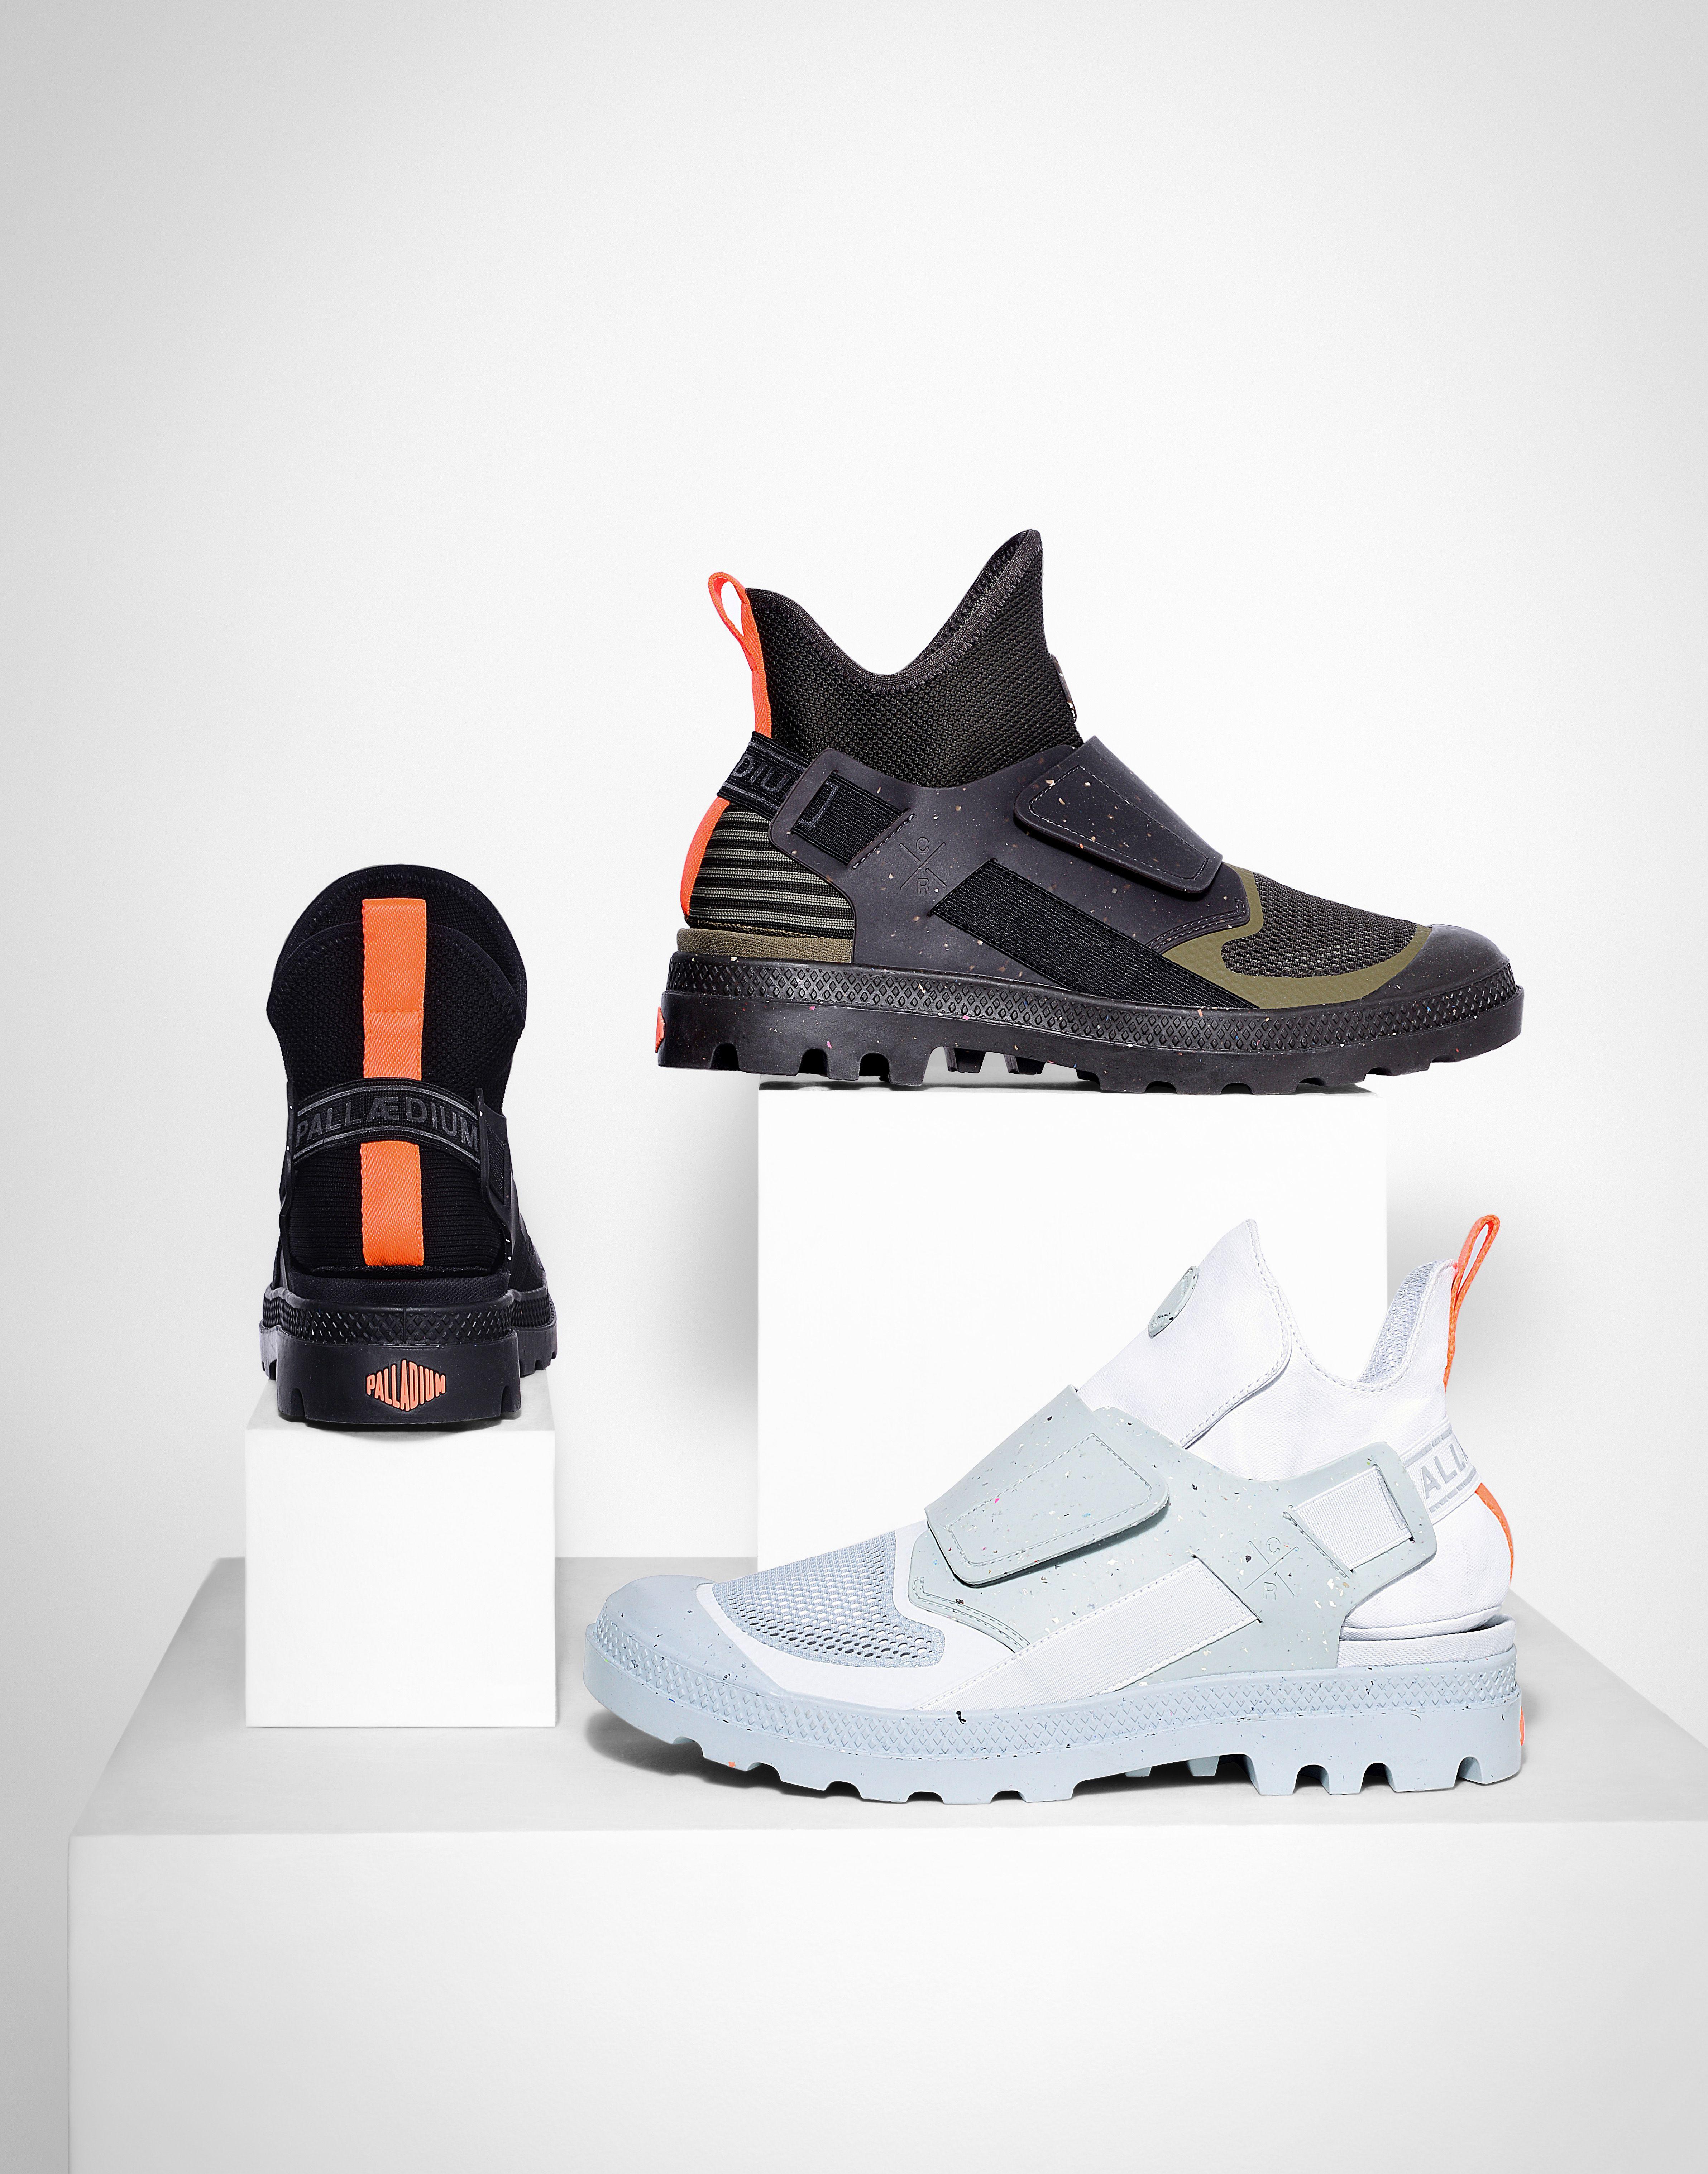 054f5f430 Palladium × Christopher Ræburn Palladium Shoes, Christopher Raeburn, Layers  Design, Running Sneakers,